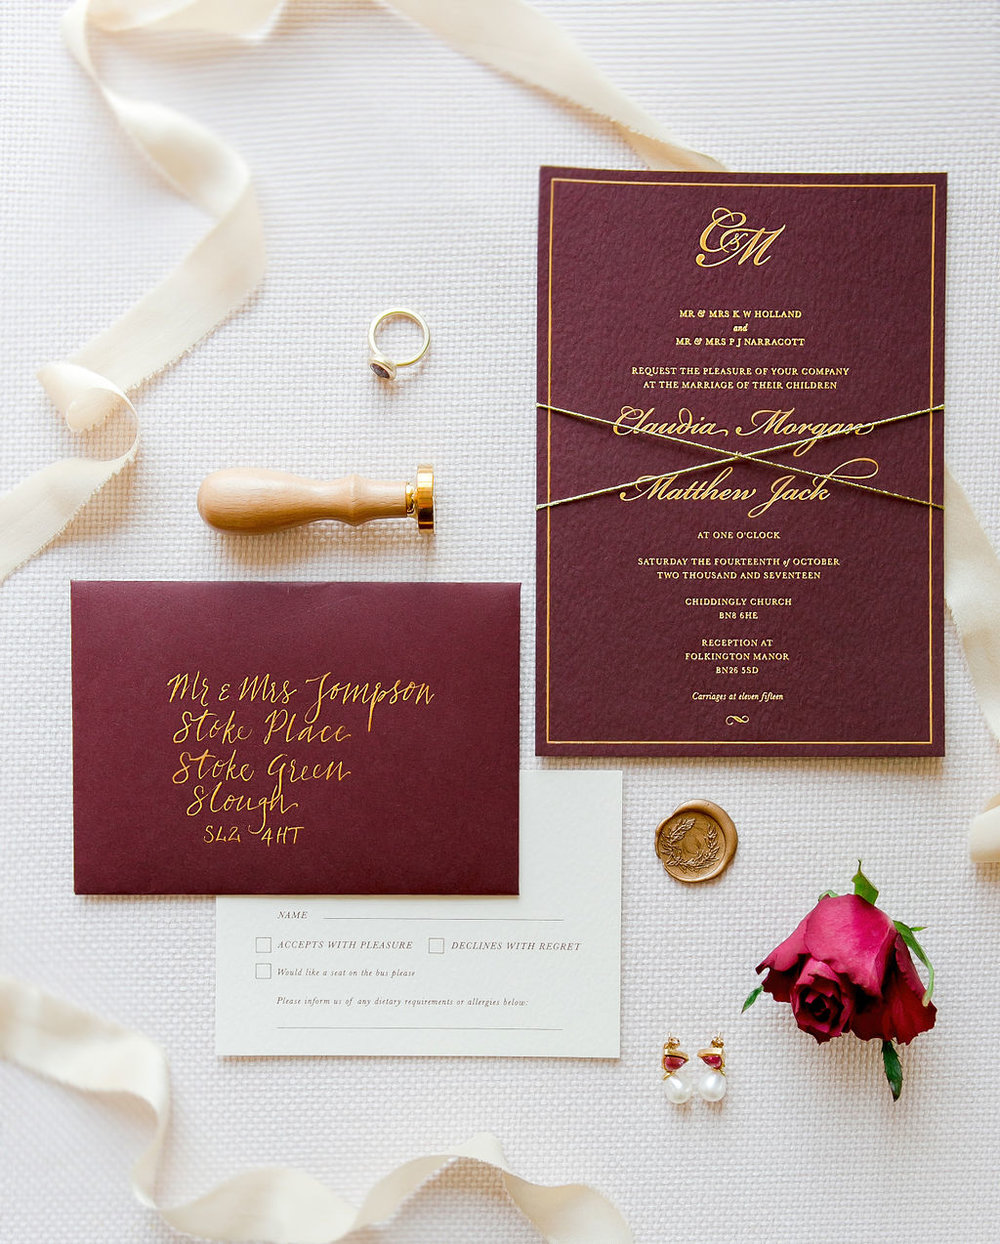 folkington_manor_claret_dappled_wedding_invite_stationery_monogram_gold_foil_wax_seal_06.jpg